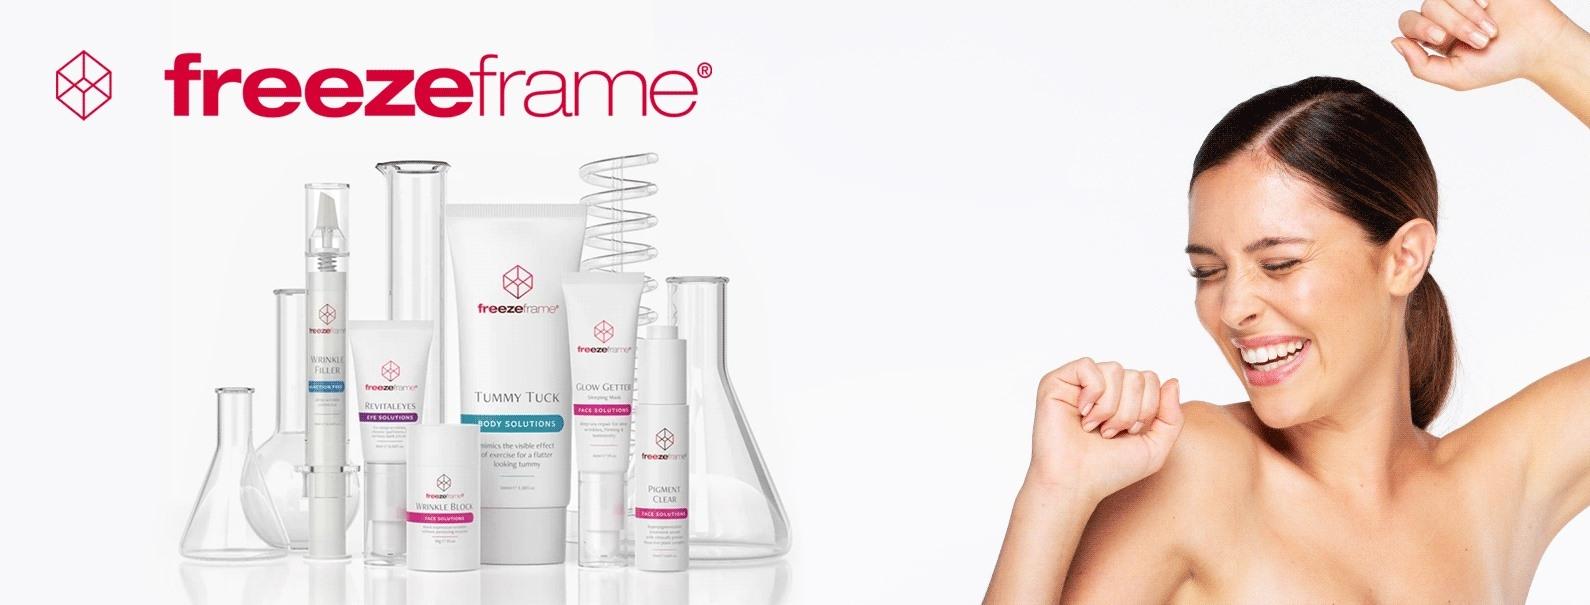 Freeze Frame (@freezeframe) Cover Image